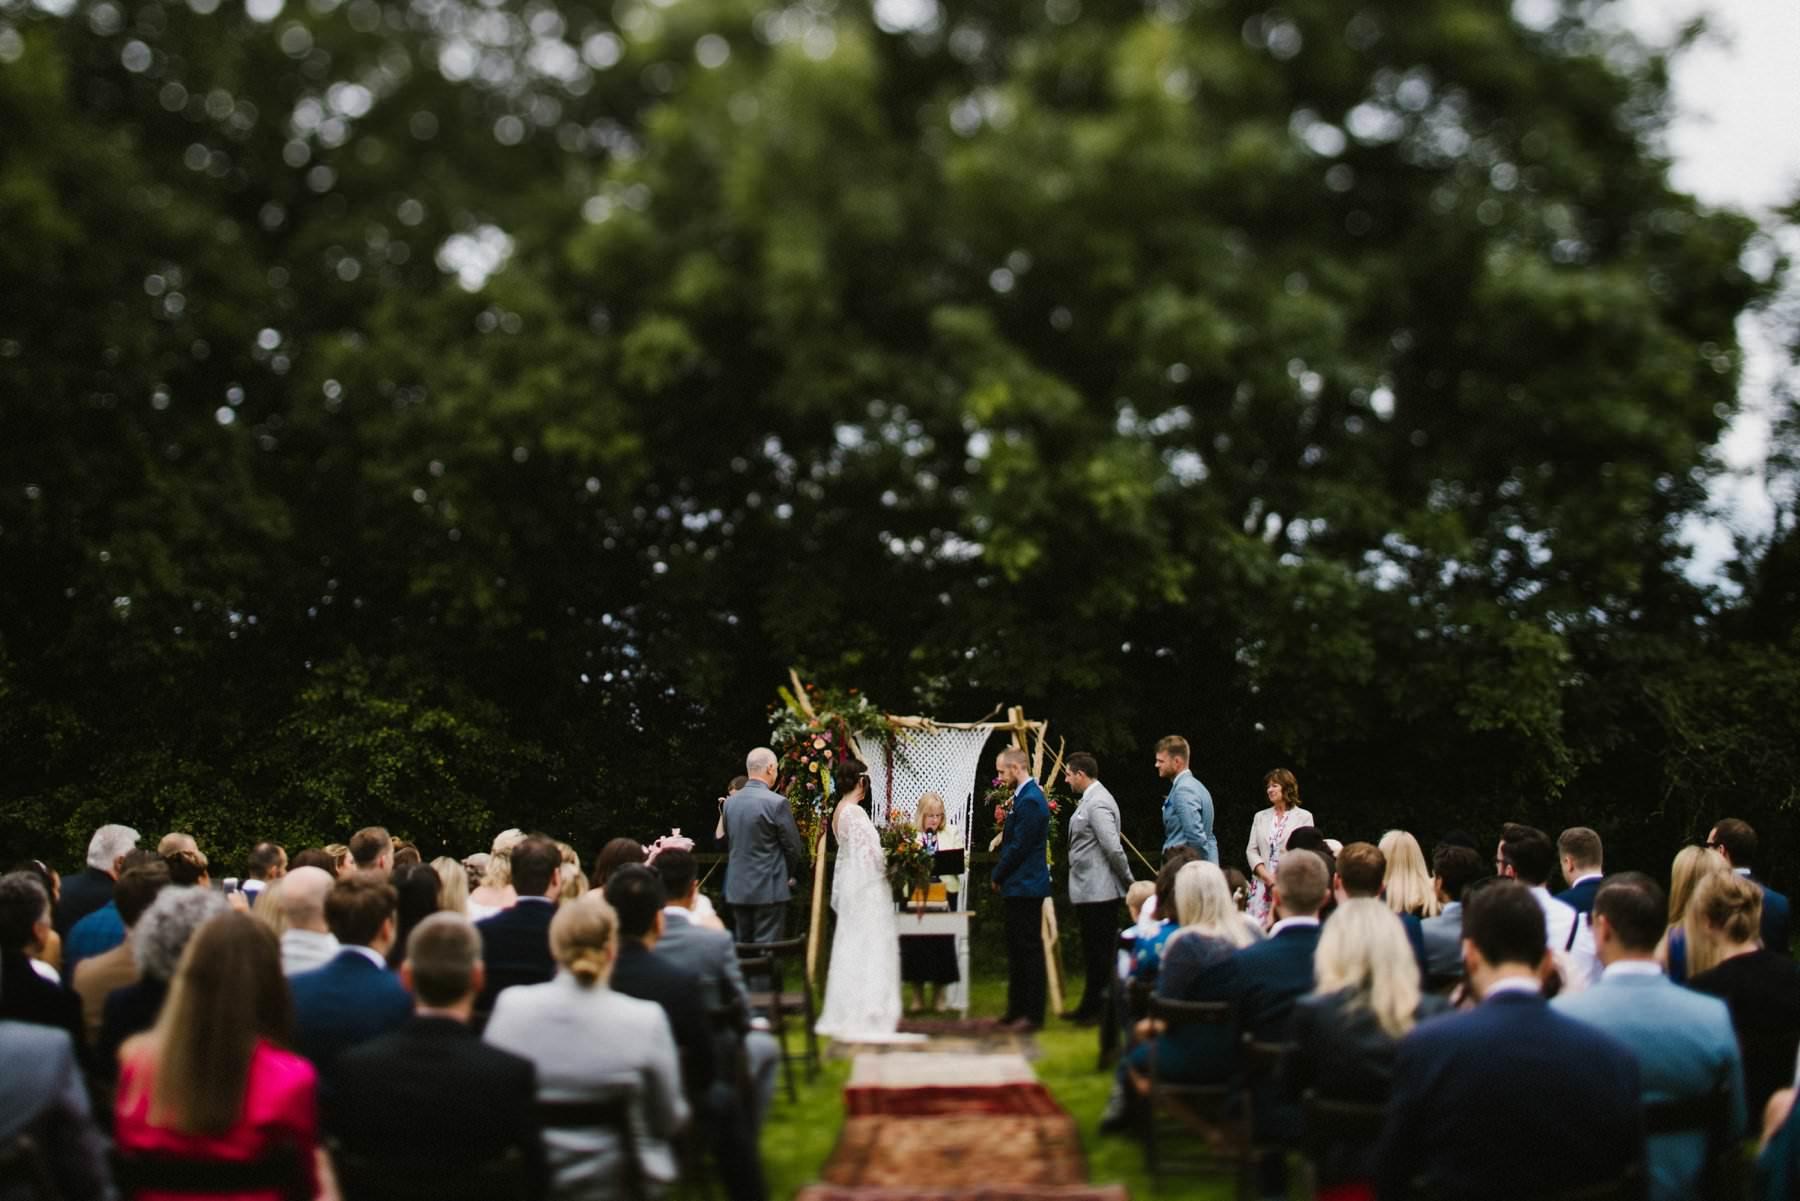 amazing outdoor wedding ceremony wedding photography